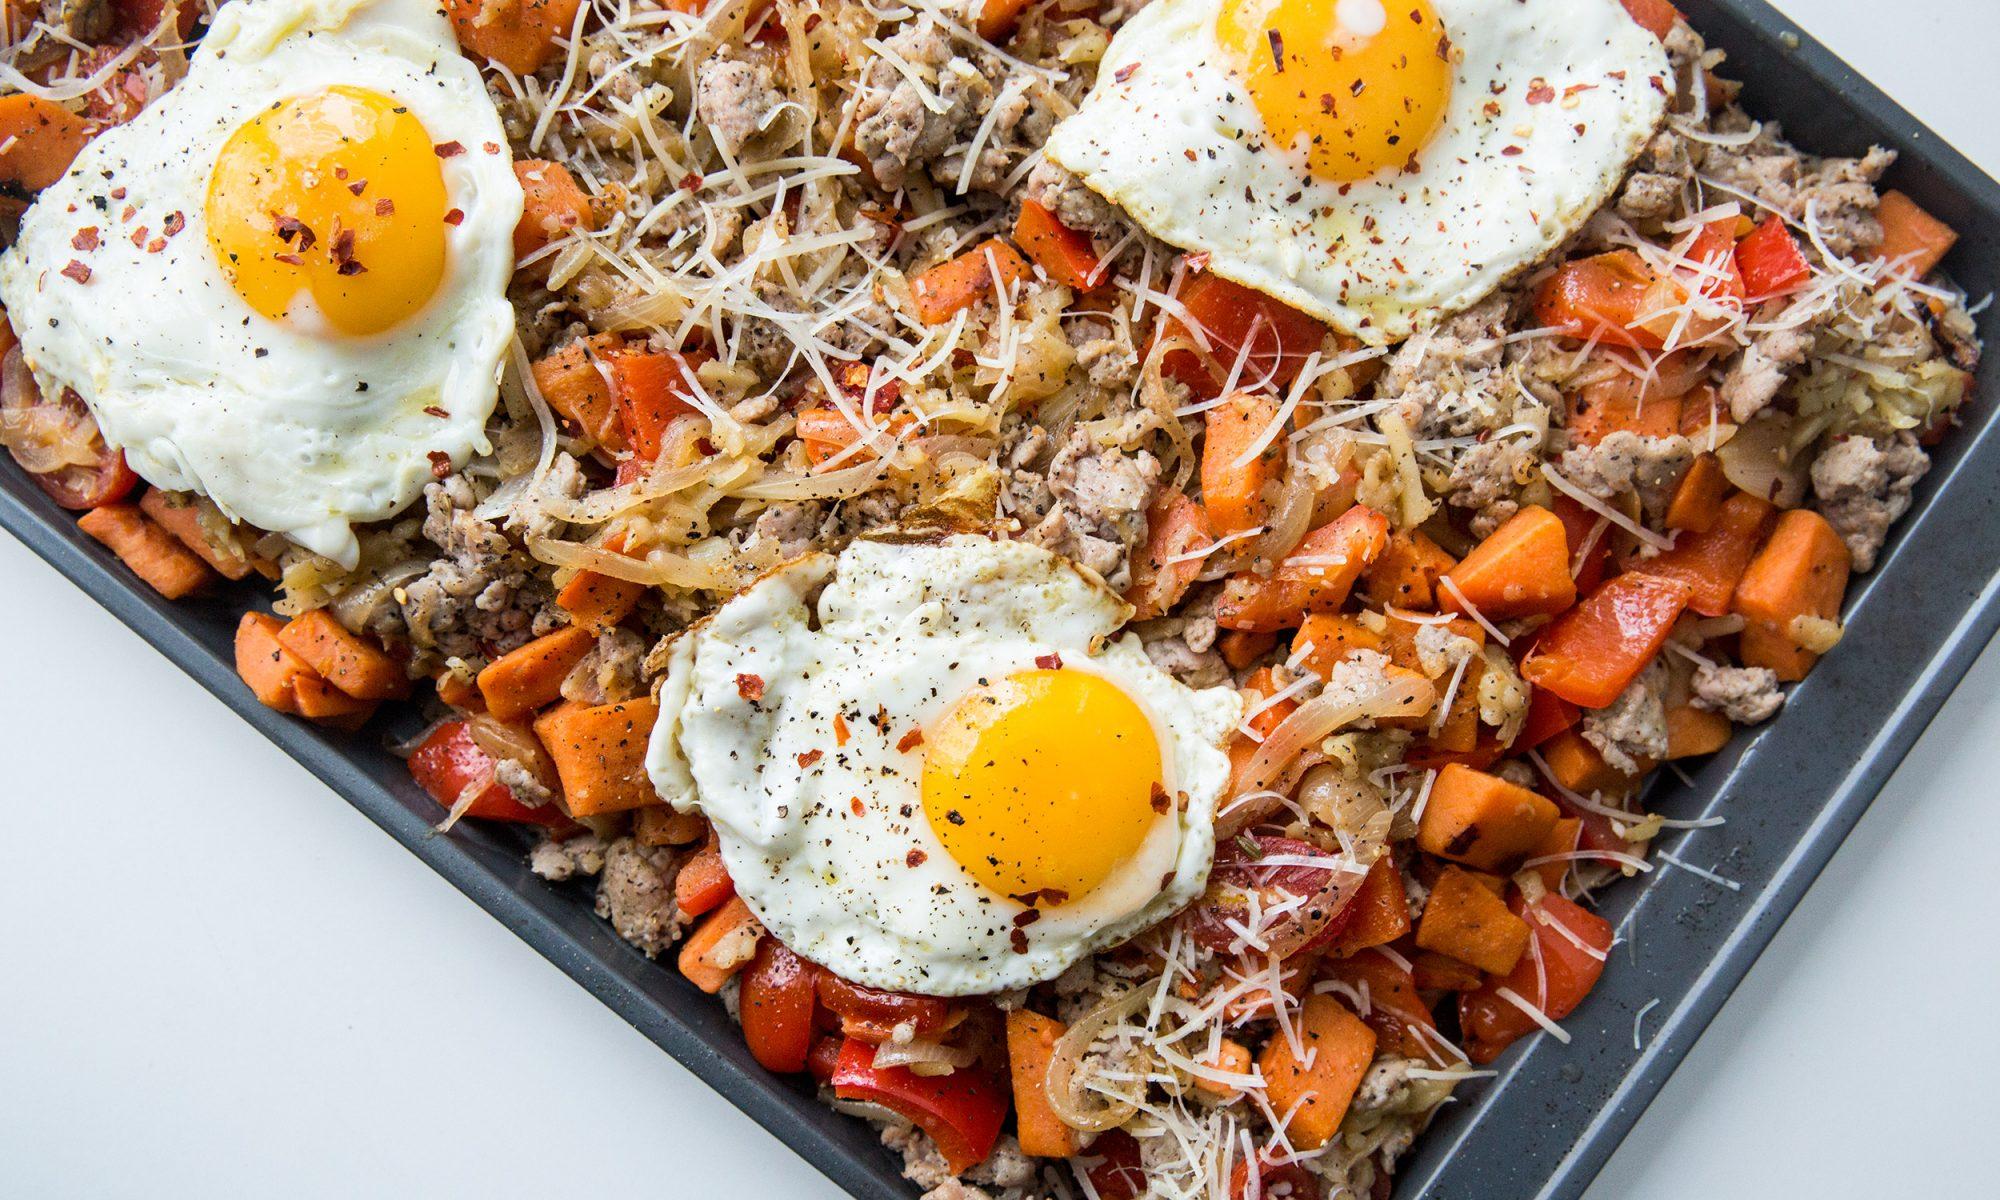 EC: 8 Sweet Potato Recipes to Brighten Up Your Breakfast